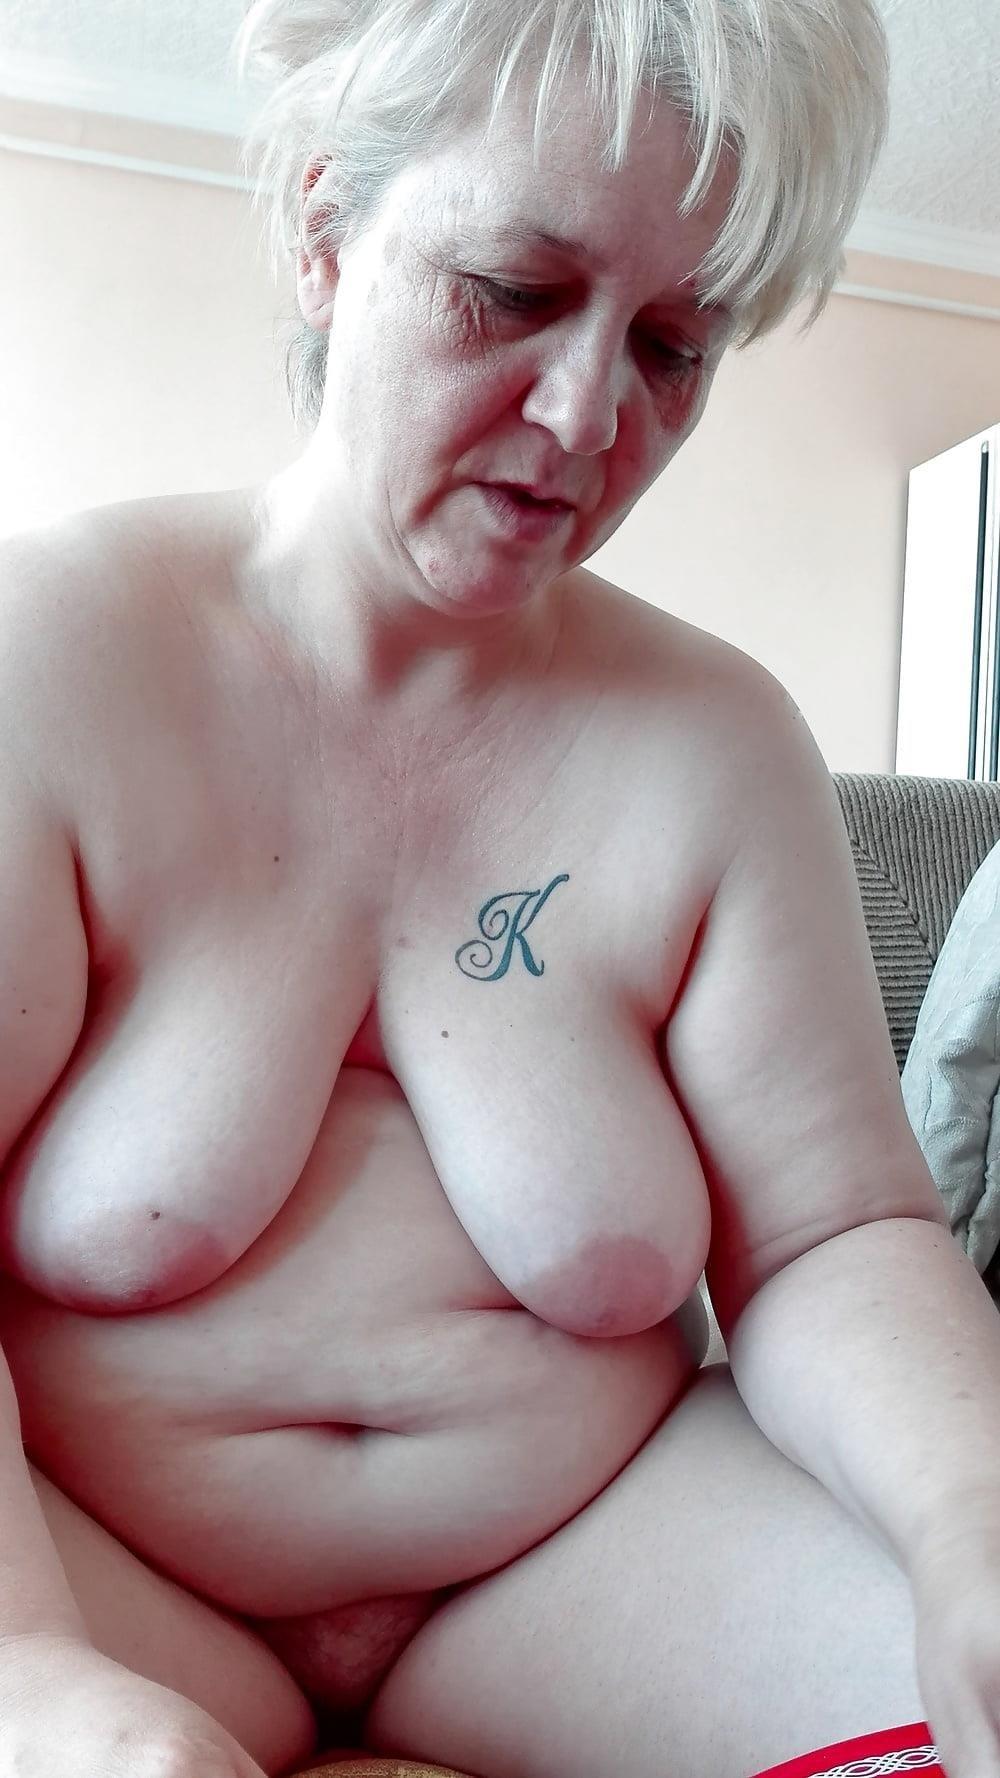 Big tits creampie pics-1991